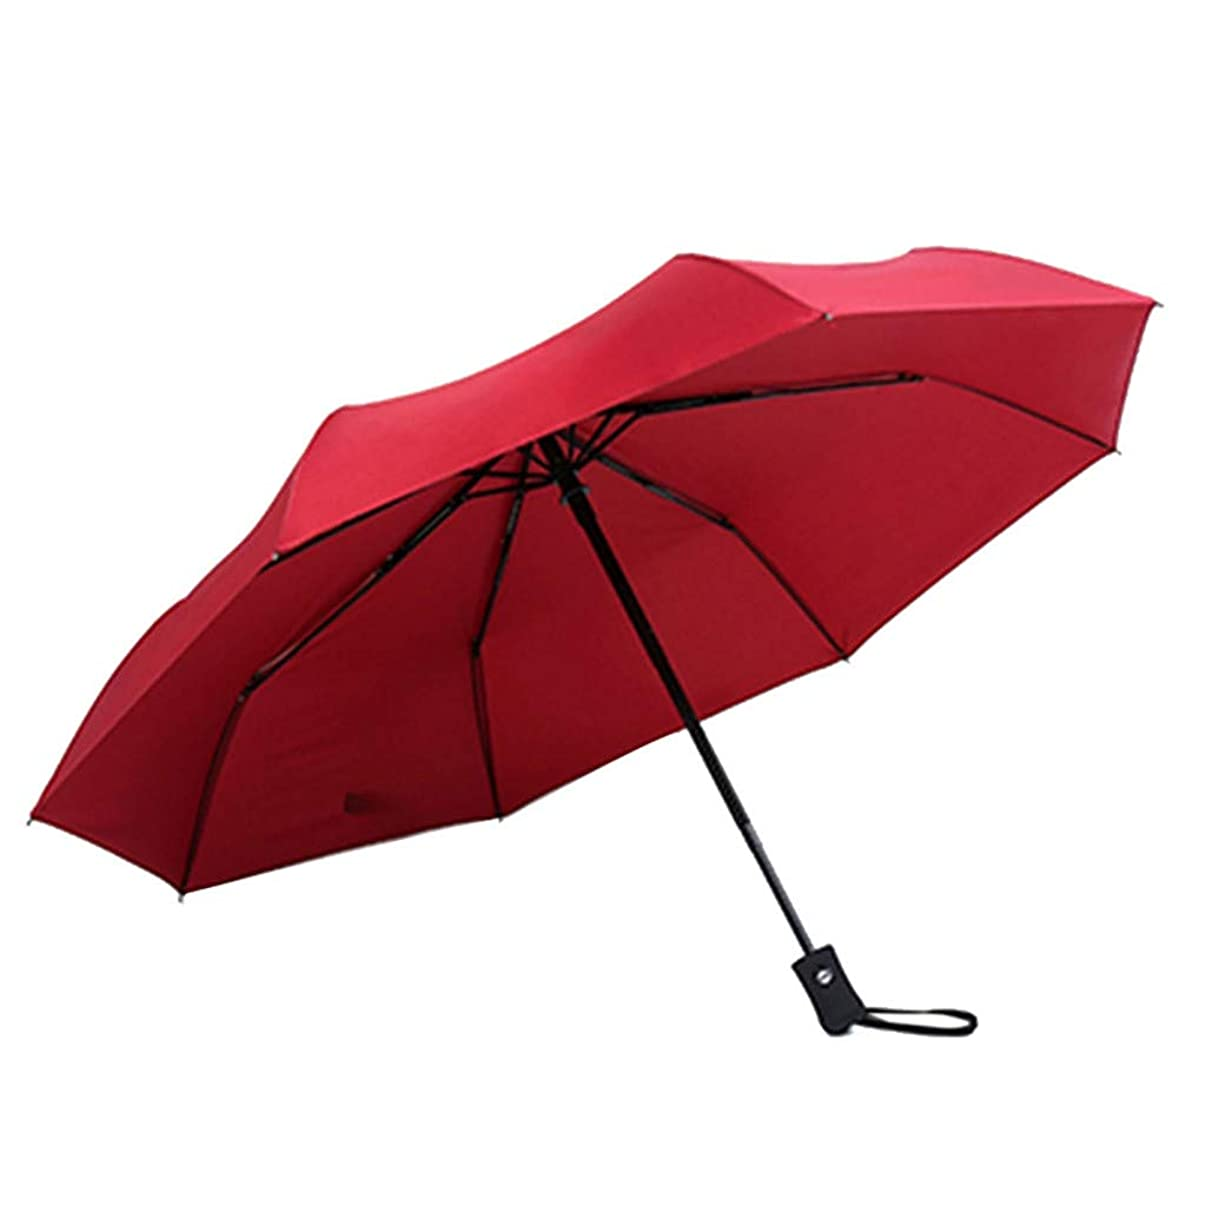 TADAMI Rain Umbrella, Windproof Double Layer Inverted Umbrellas Reverse Folding Umbrella Uv Protection Rain Gear